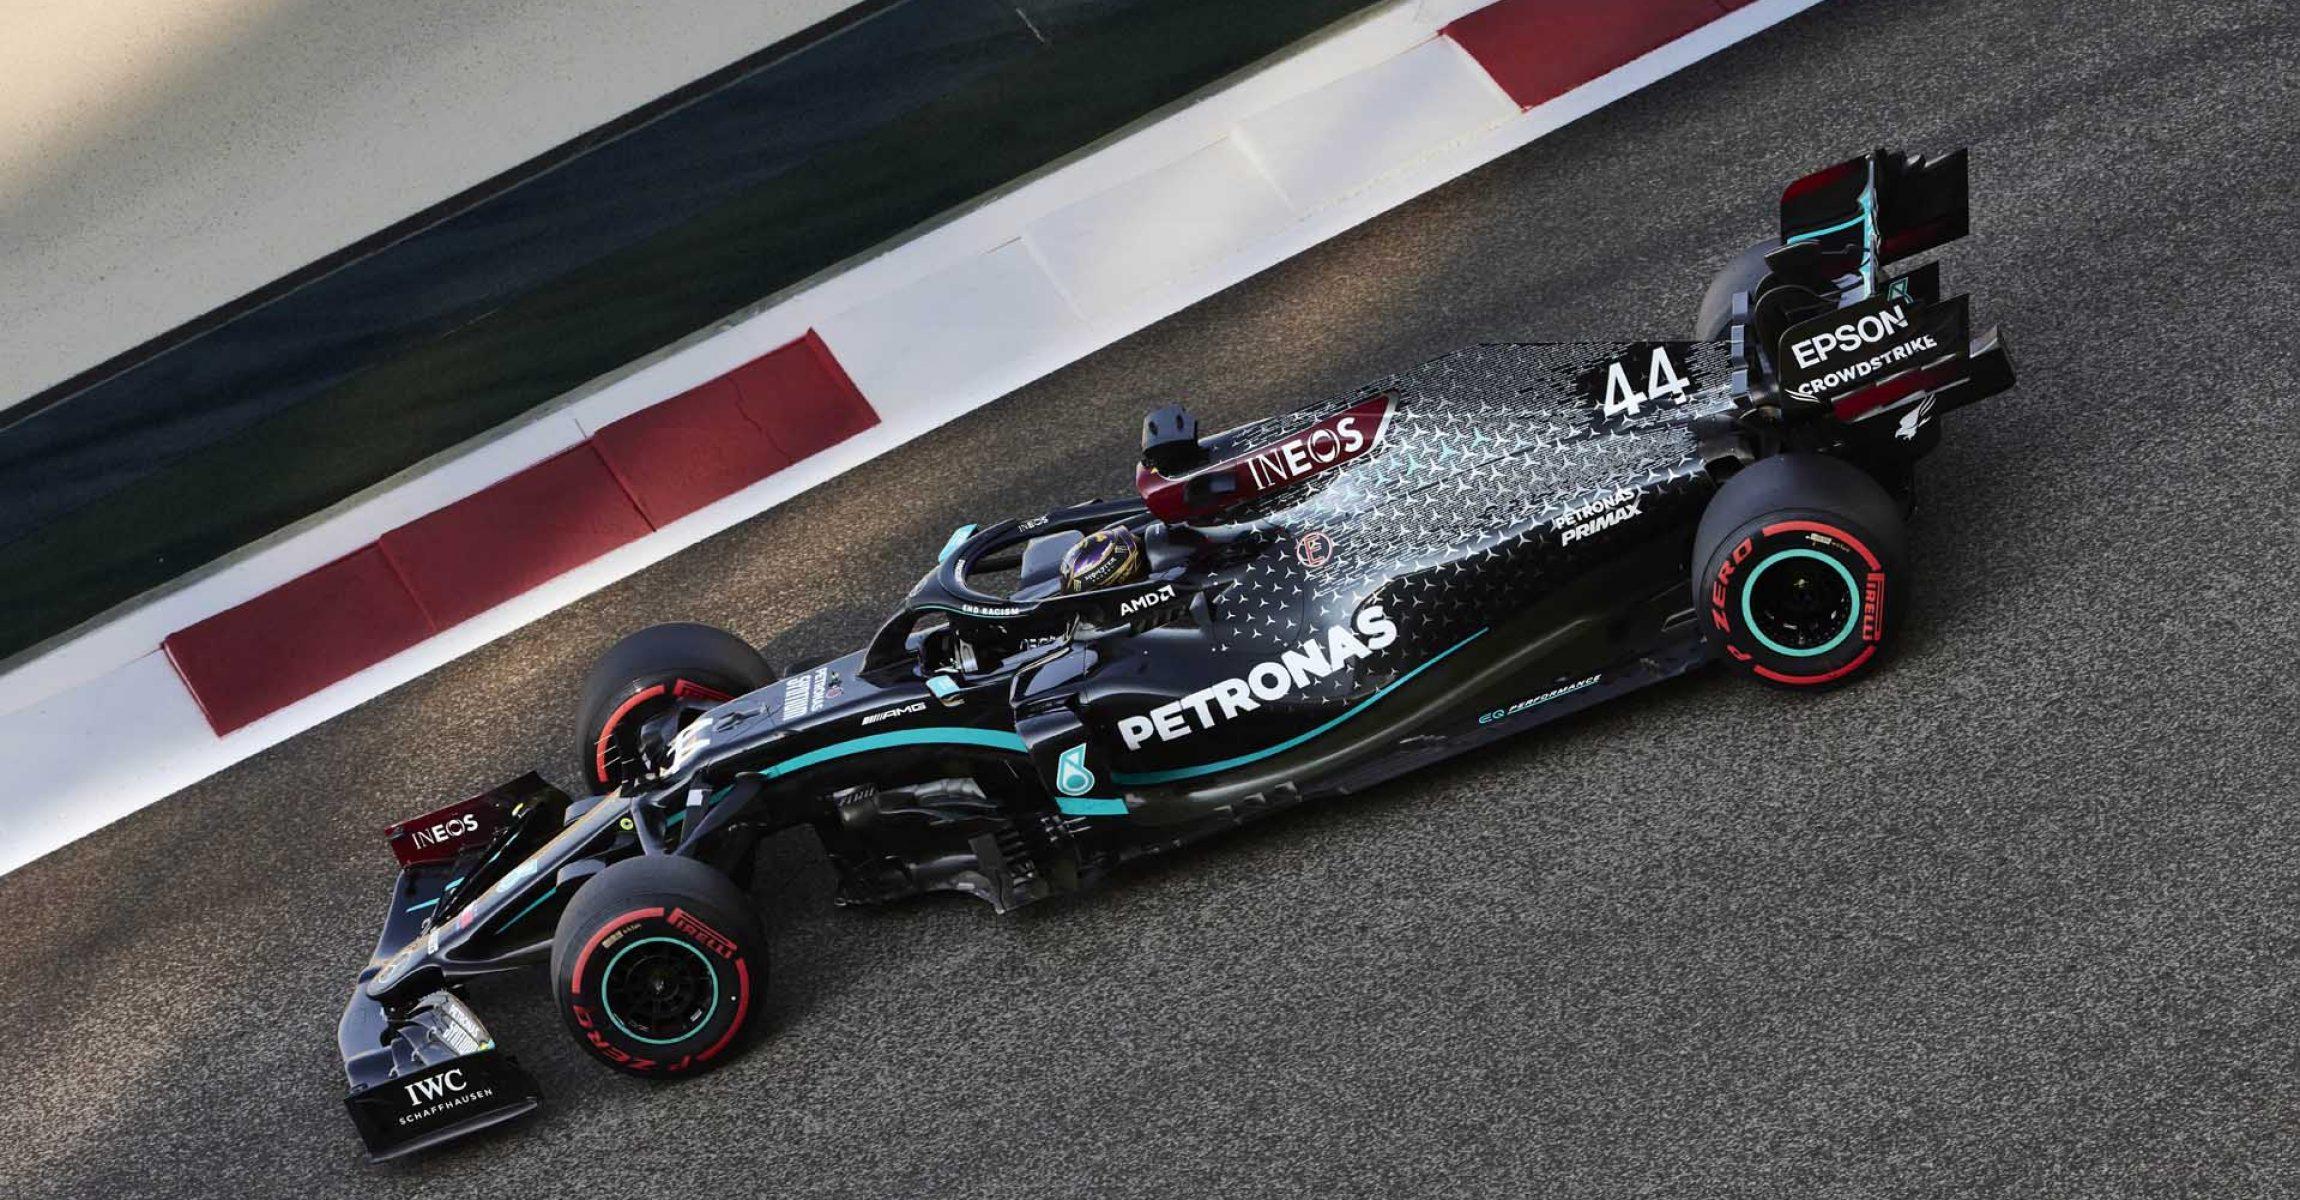 2020 Abu Dhabi Grand Prix, Saturday - Steve Etherington Lewis Hamilton Mercedes